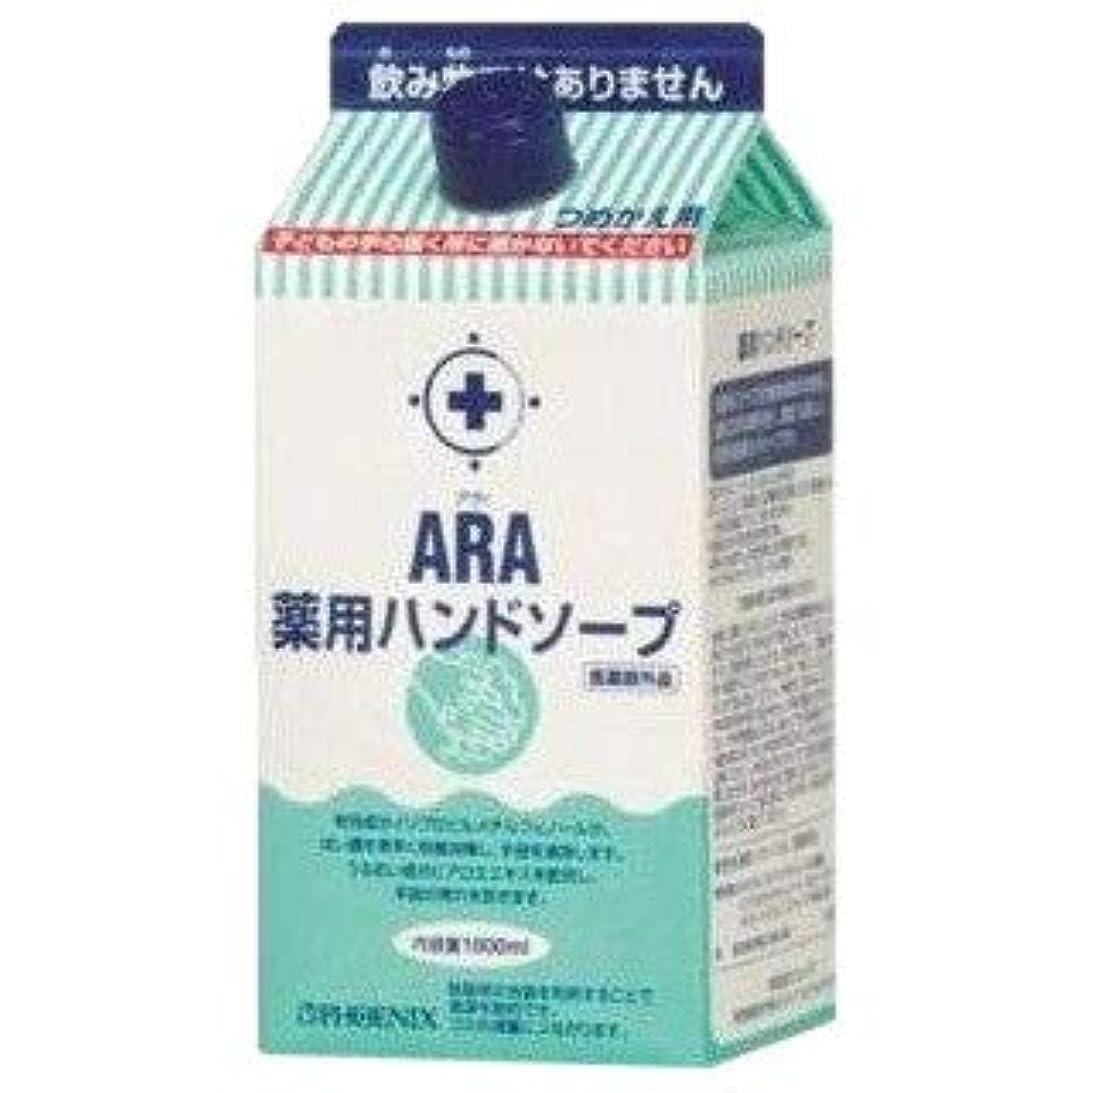 ARA 薬用ハンドソープ(詰め替え用) 1000ml×12入